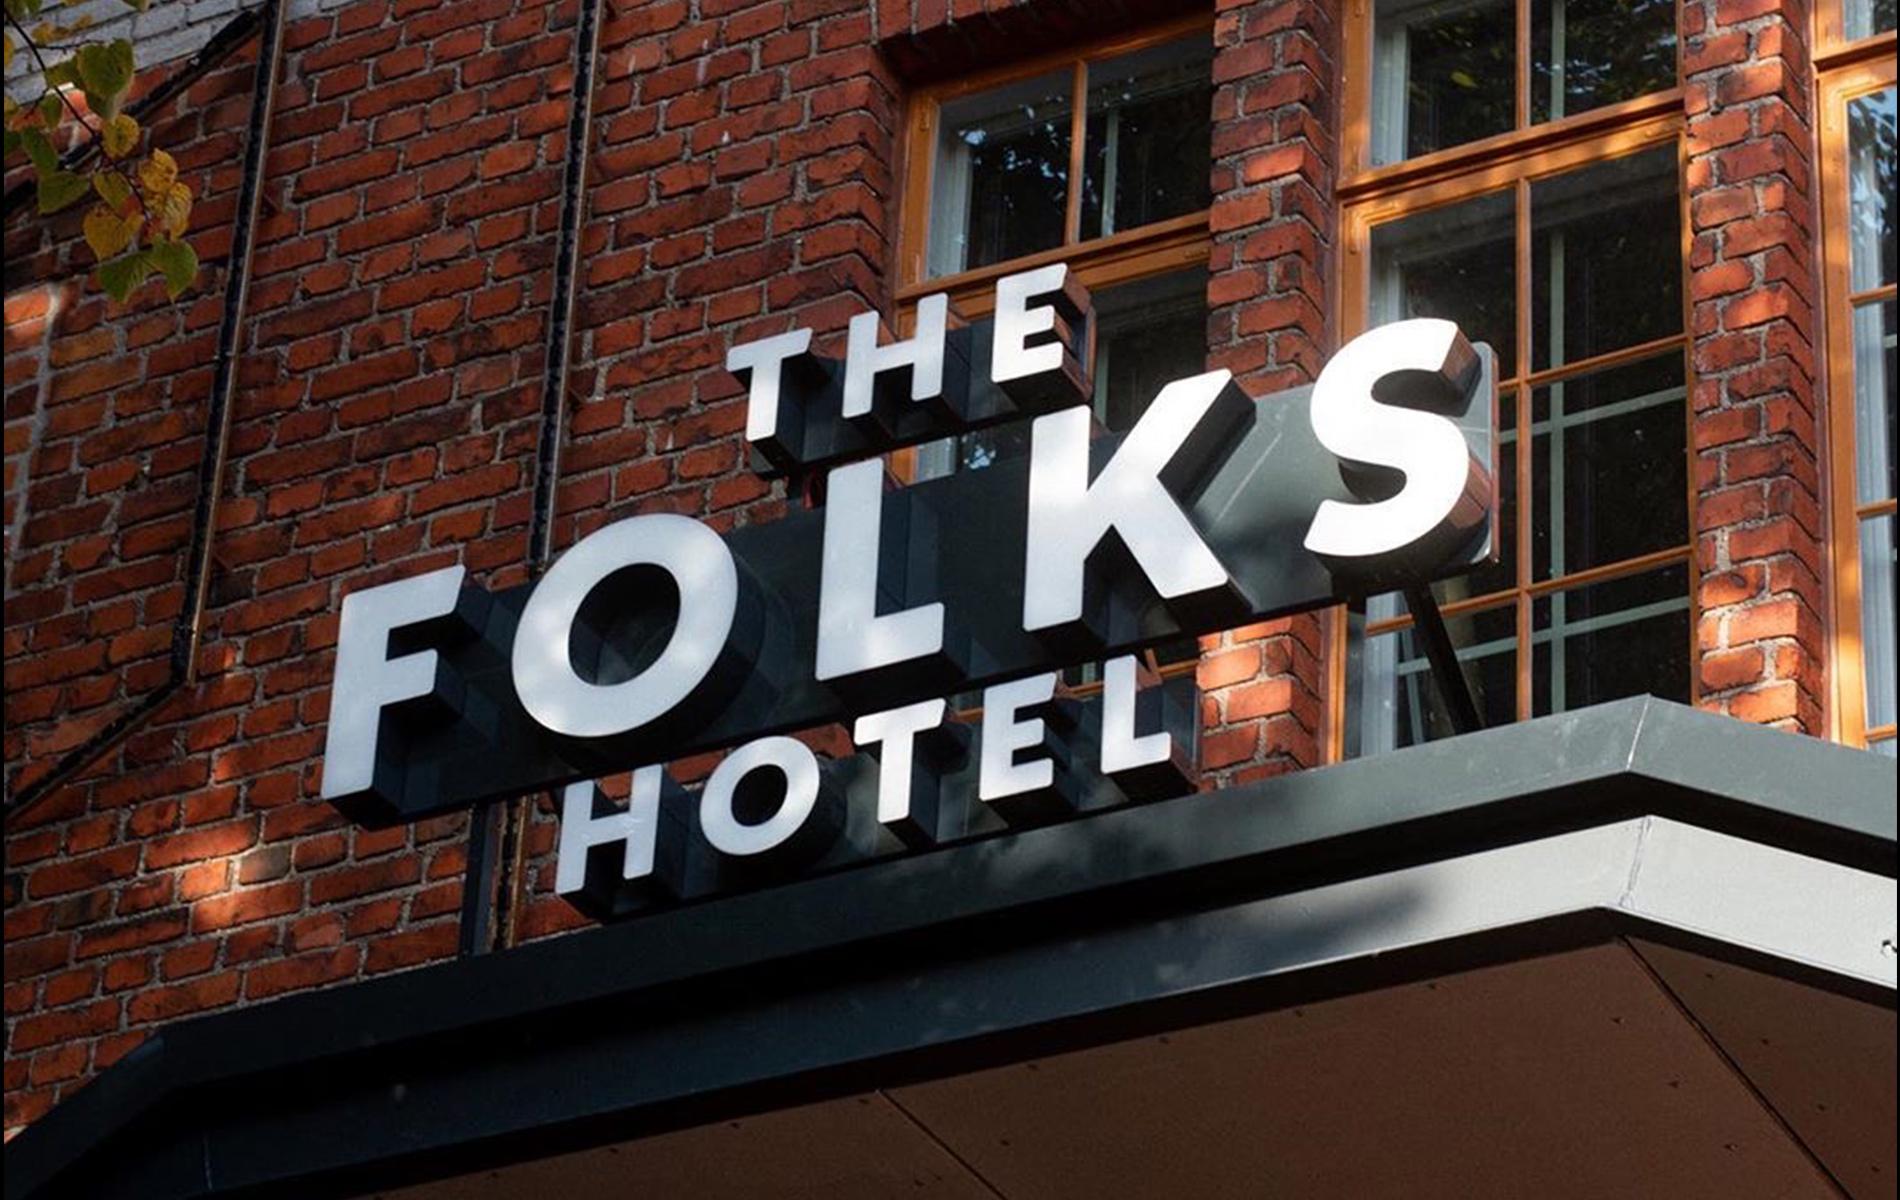 The Folks Hotel